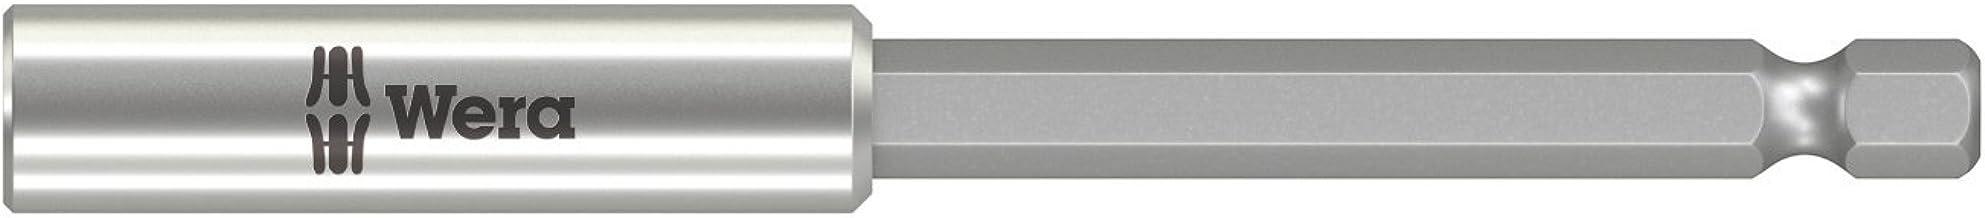 899/4/1 uniwersalny uchwyt, 1/4 cala x 100 mm x 1/4 cala, Wera 05053459001